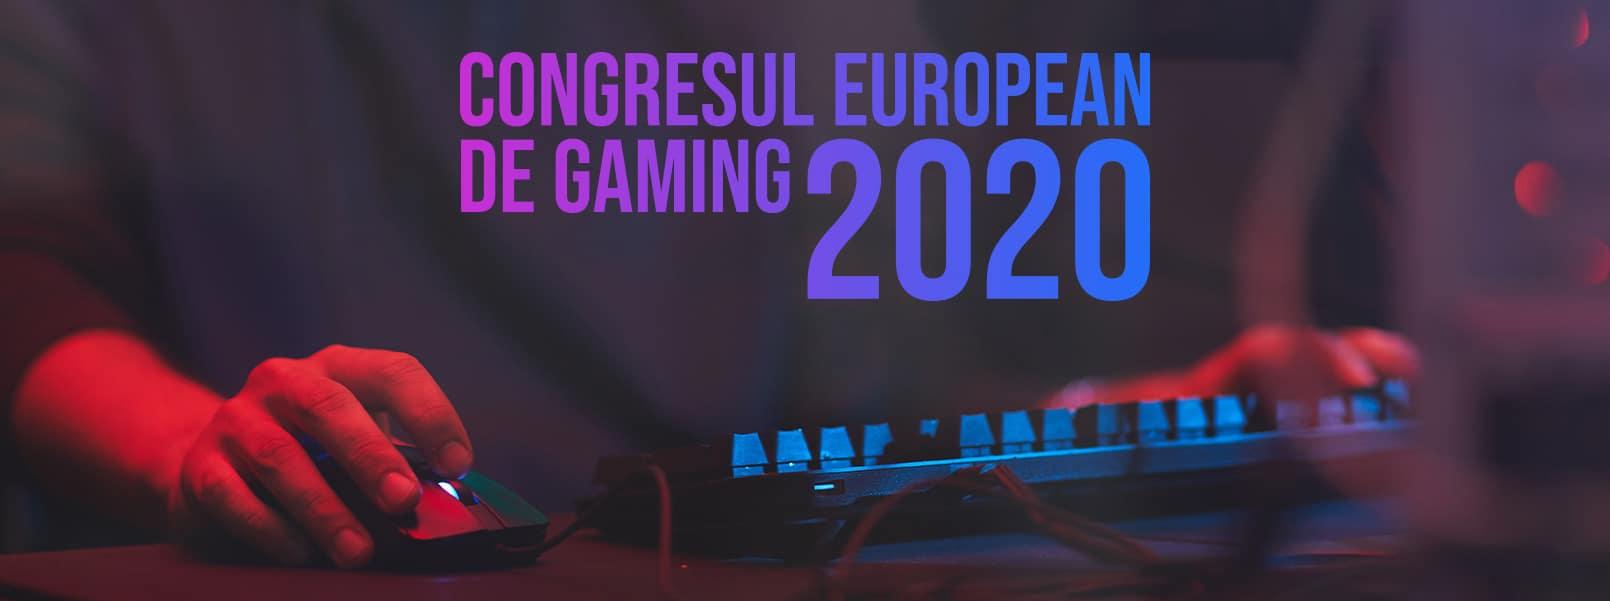 Congresul european de Gaming